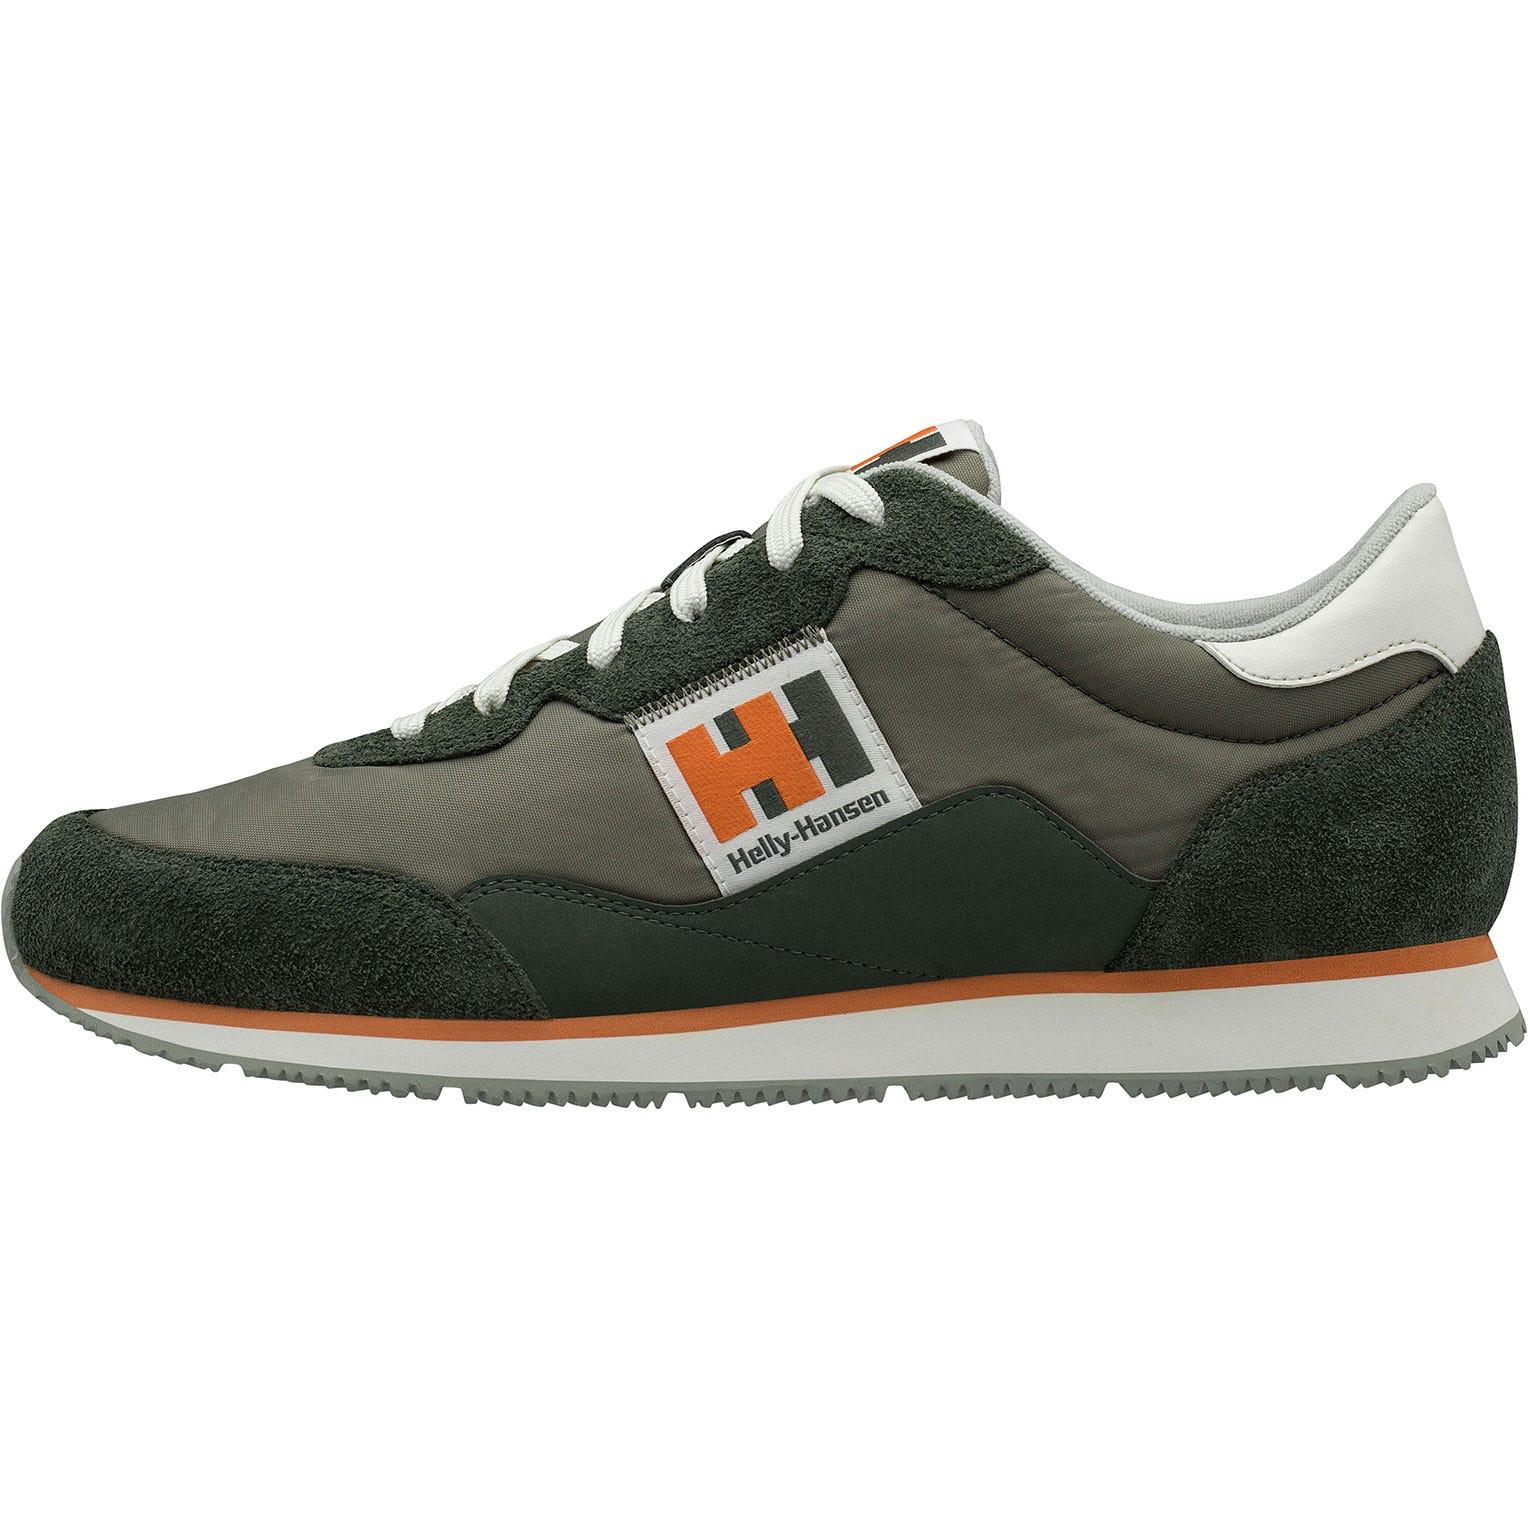 Helly Hansen Ripples Lowcut Sneaker Mens Green 46.5/12